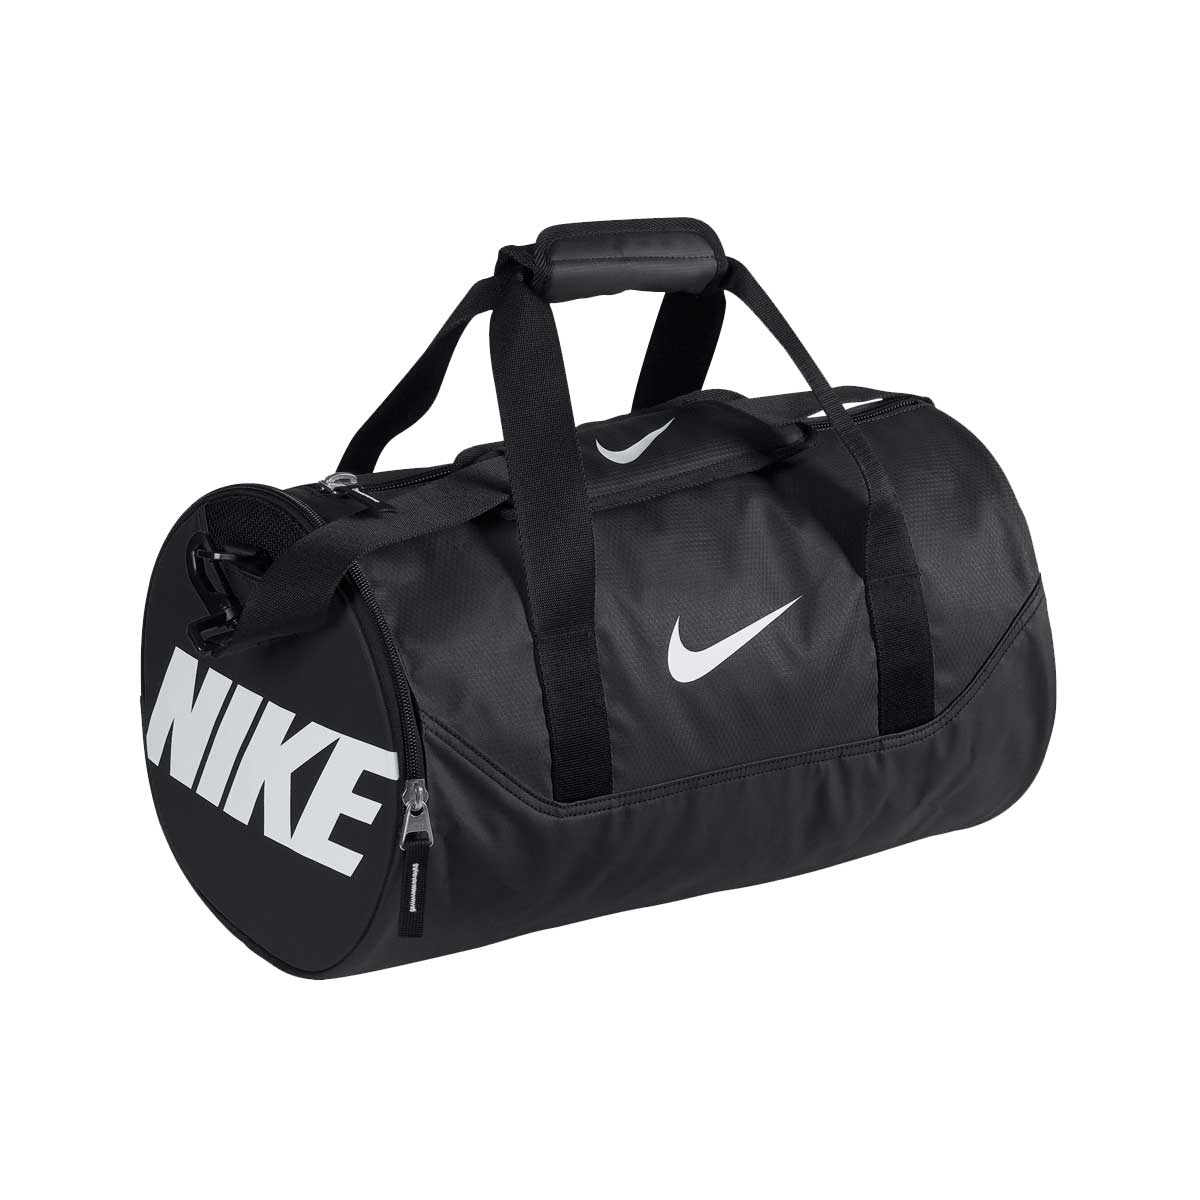 4b217b6c70024 Buy Nike Team Training Mini Duffle Bag Online India